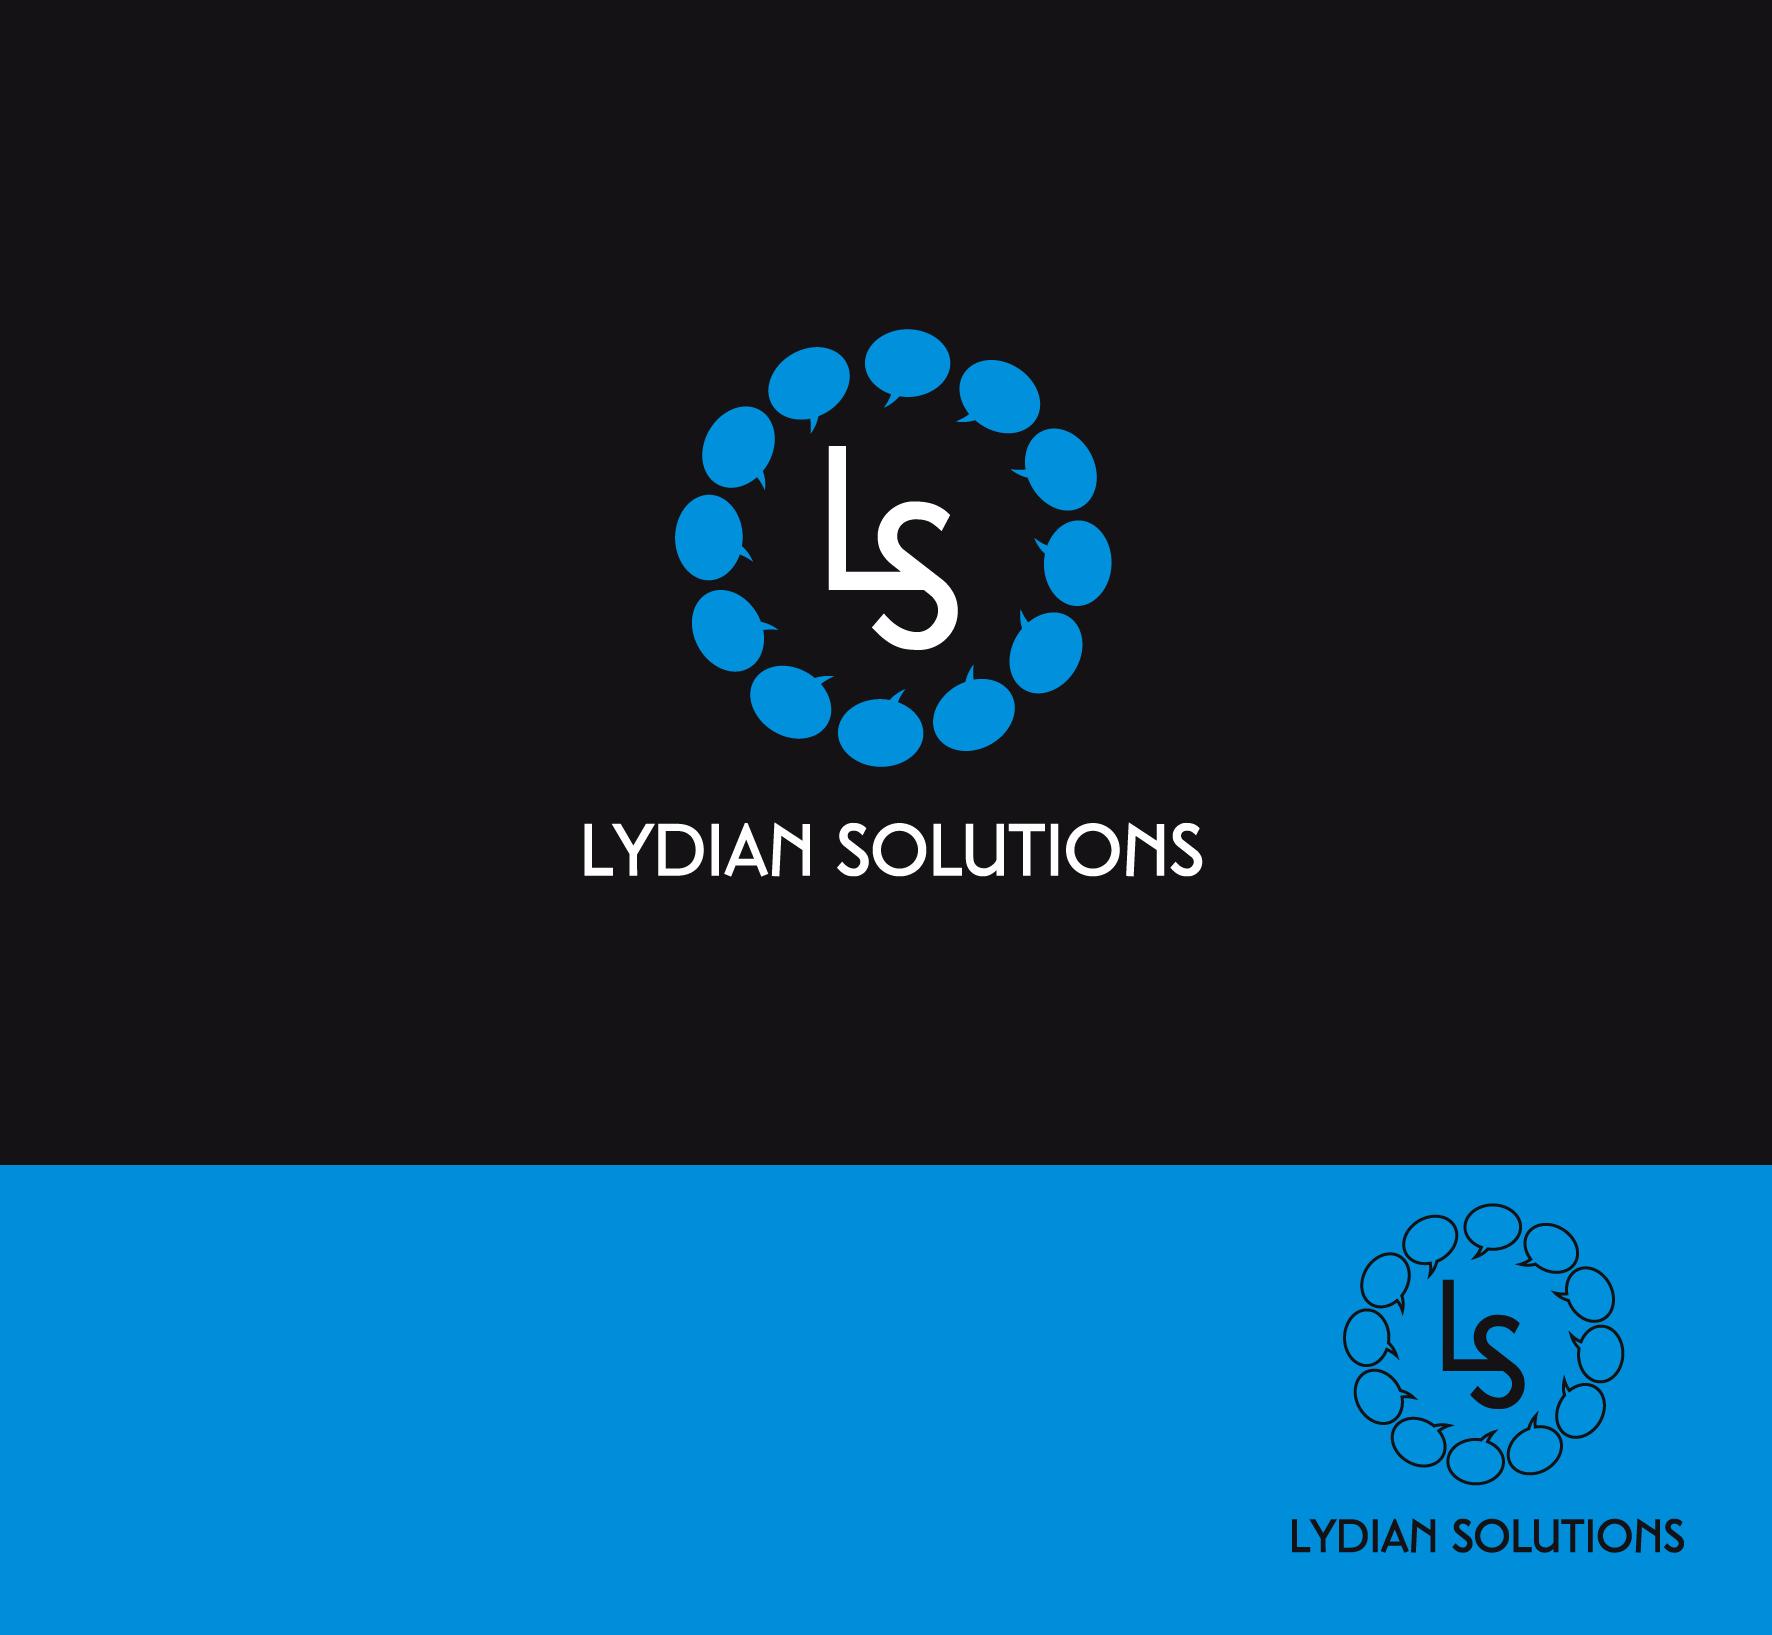 Logo Design by luna - Entry No. 44 in the Logo Design Contest Fun Logo Design for Lydian Solutions.